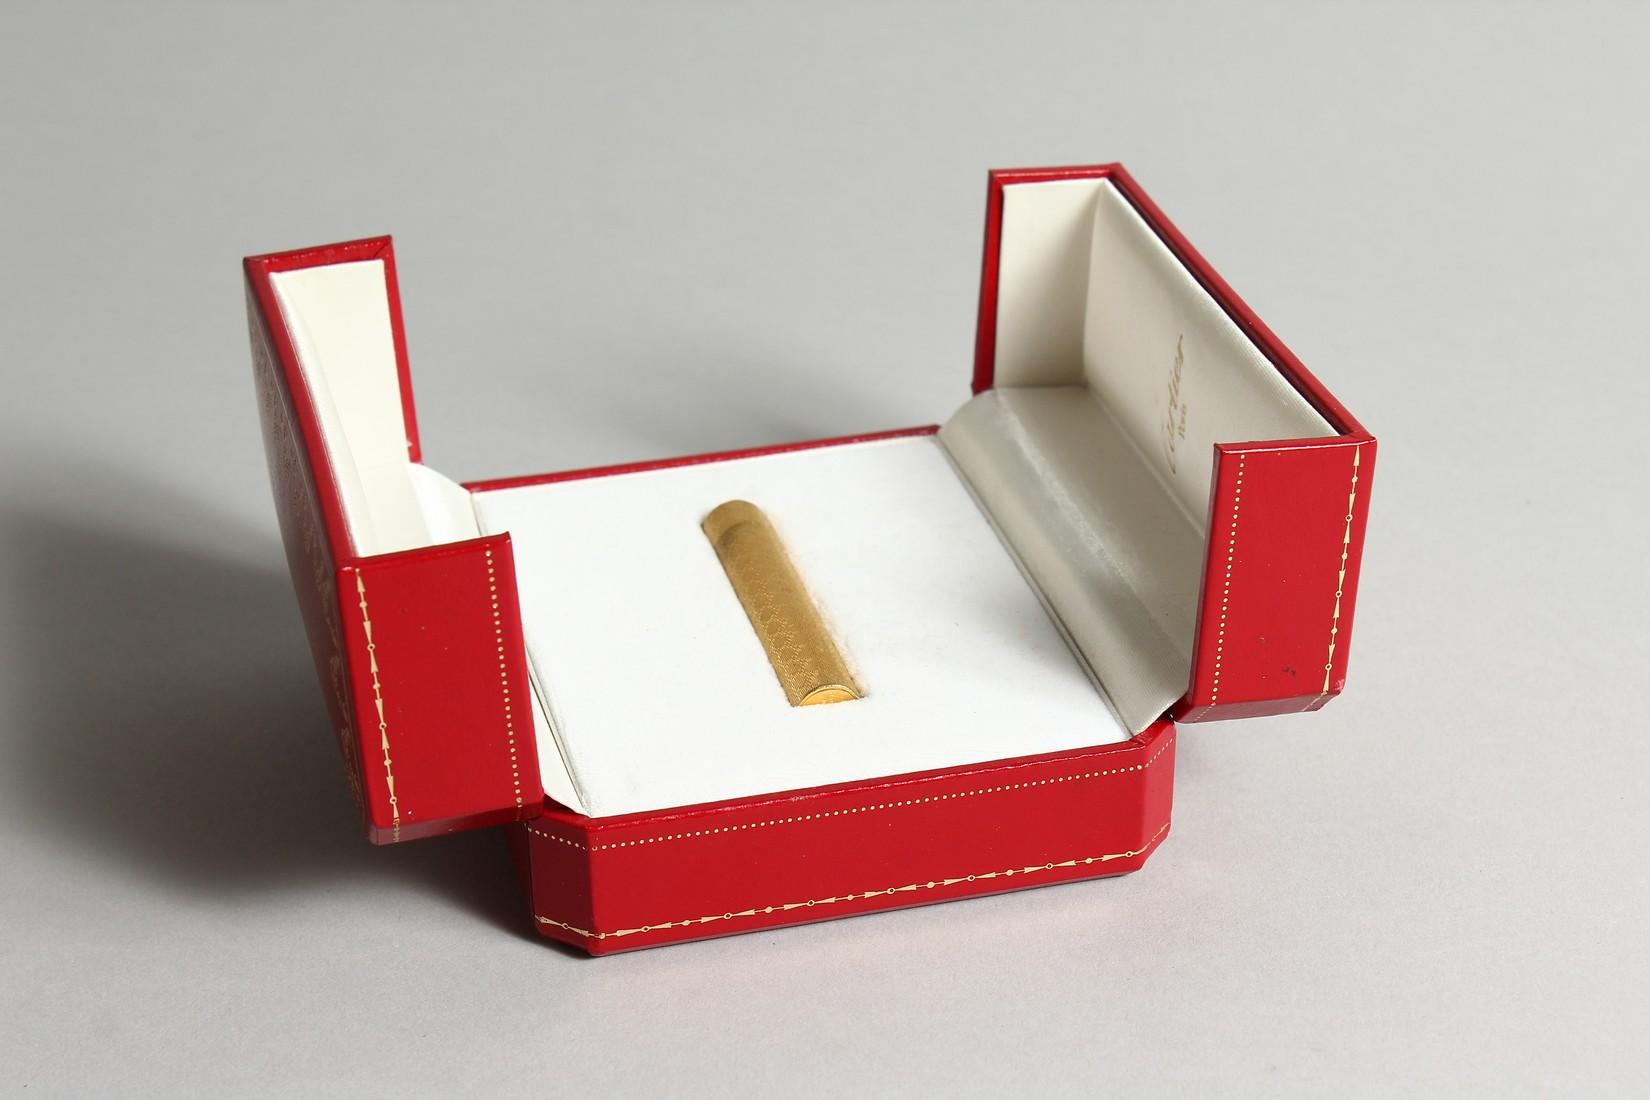 A GOOD CARTIER LIGHTER in original box. - Image 9 of 9